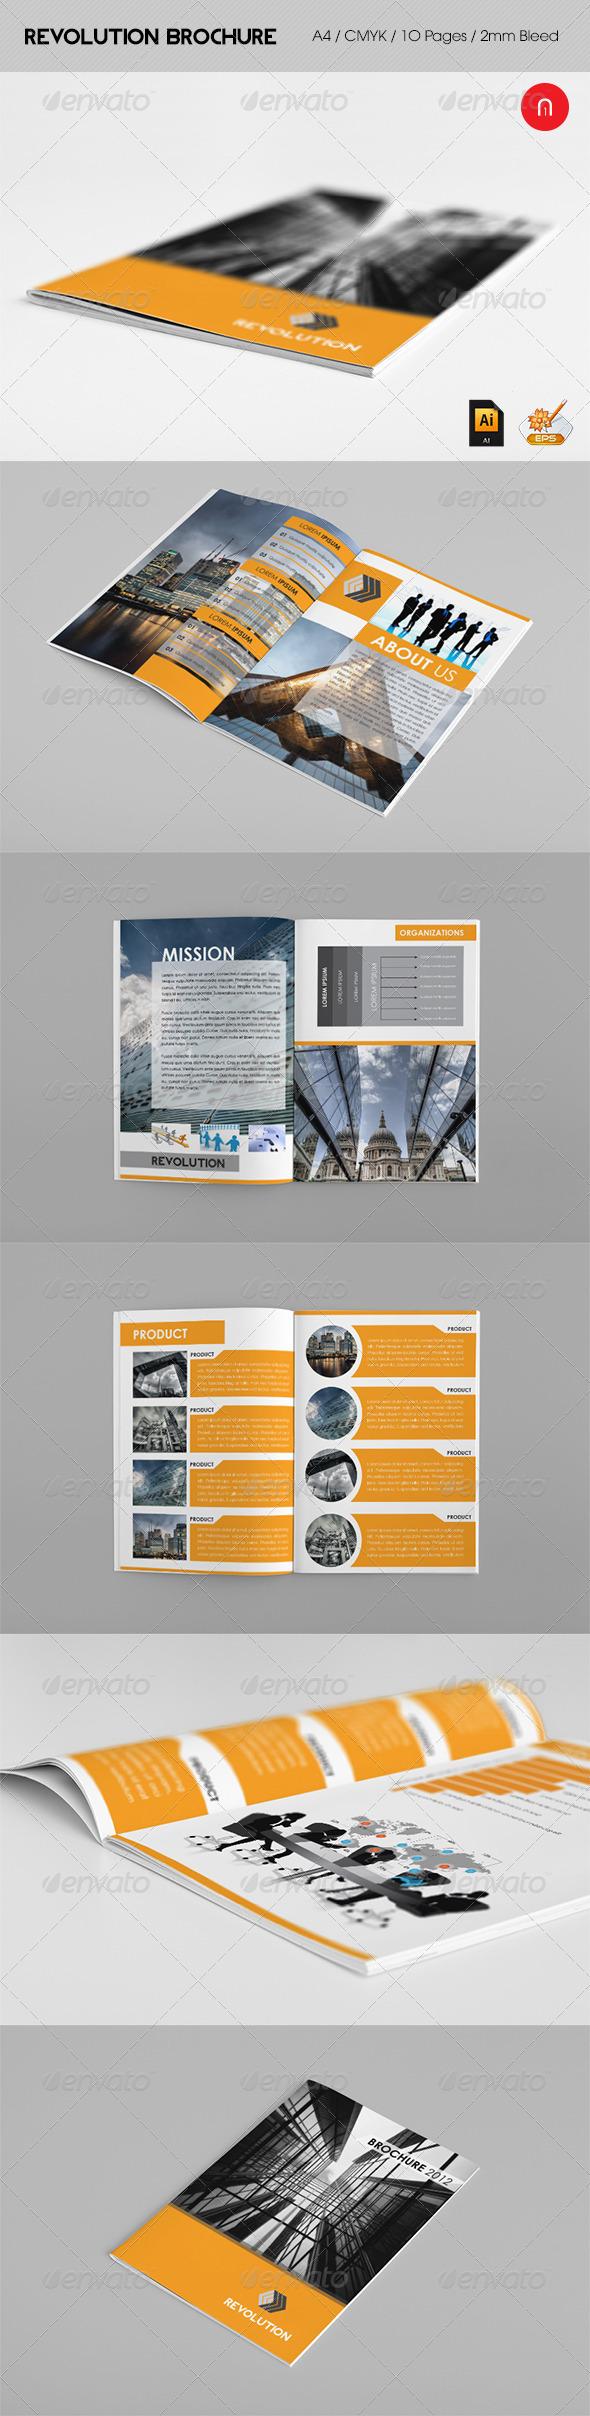 Revolution Brochure 2012 - Brochures Print Templates